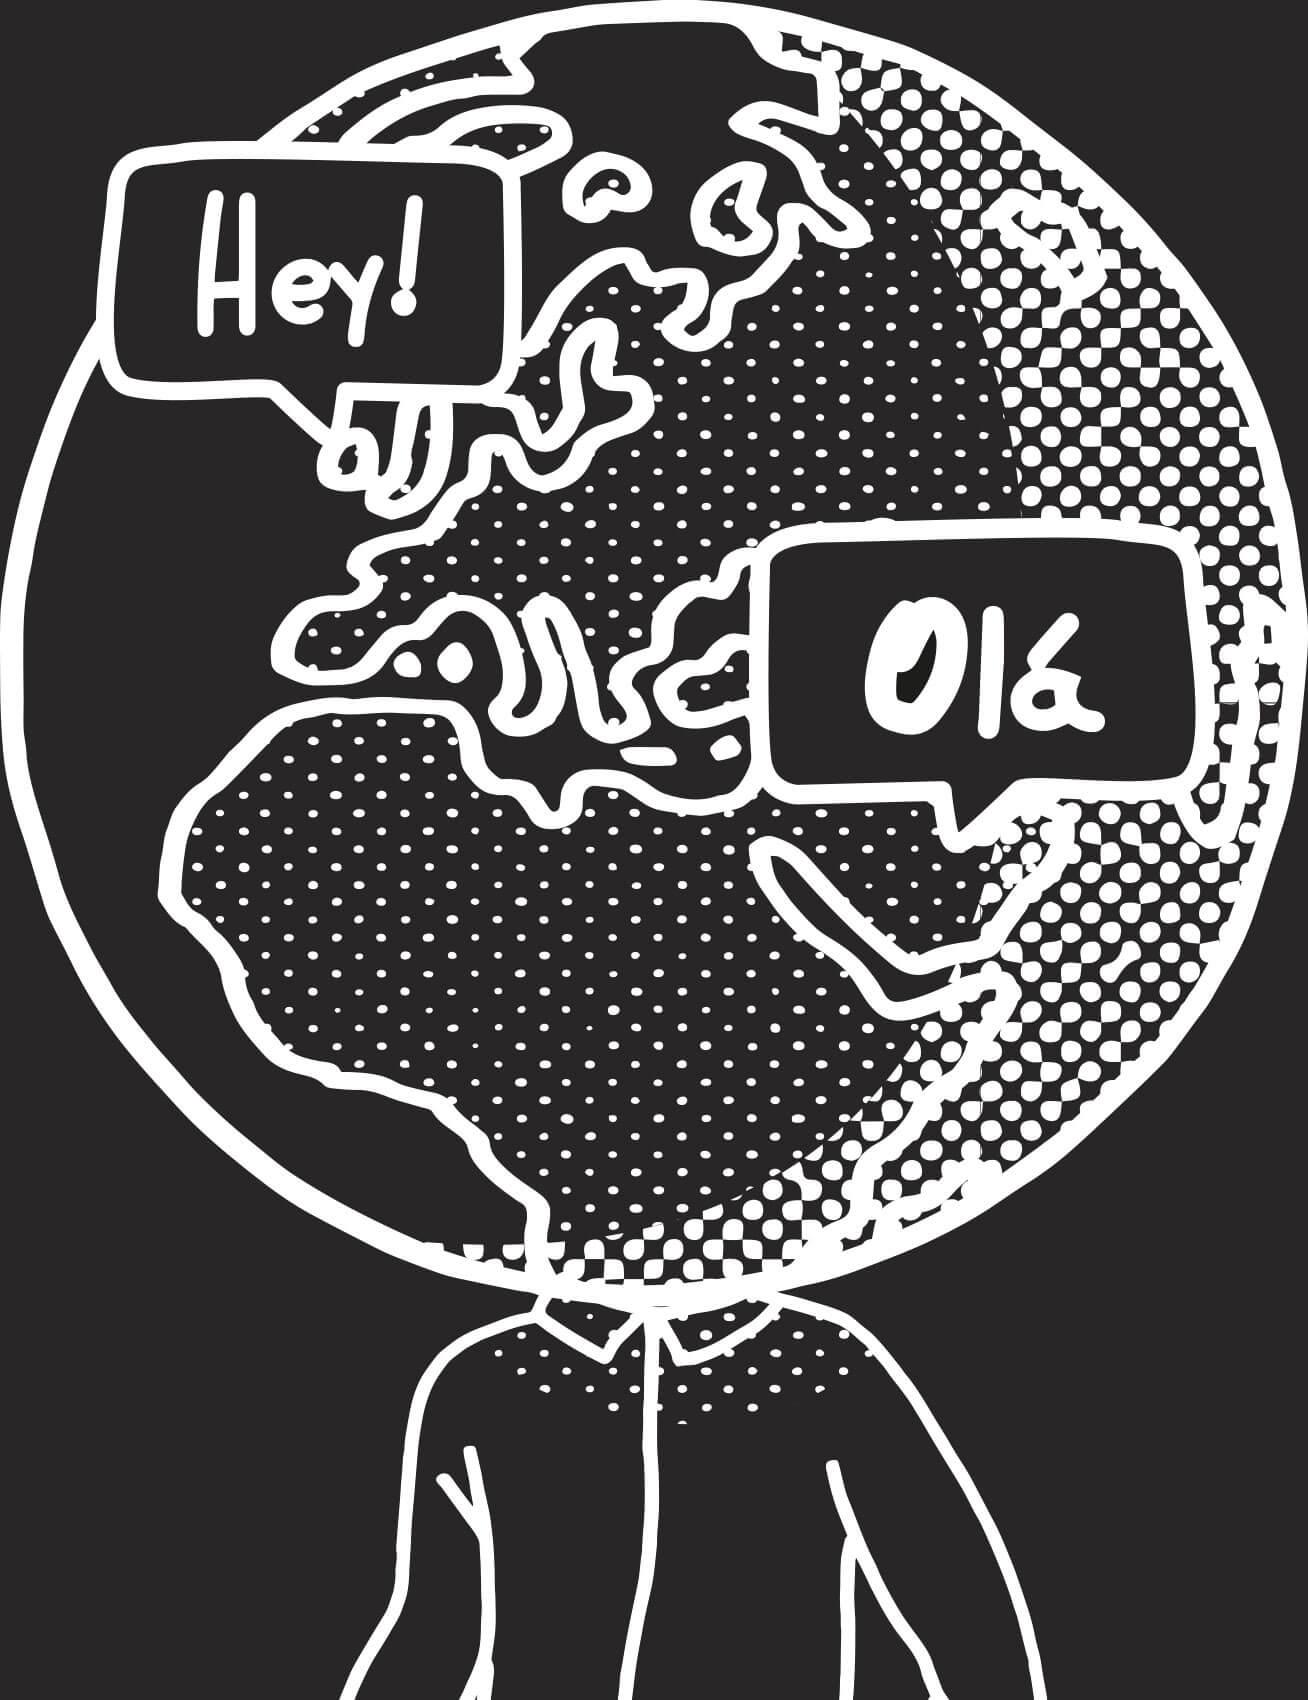 Globe – Hey – Ola